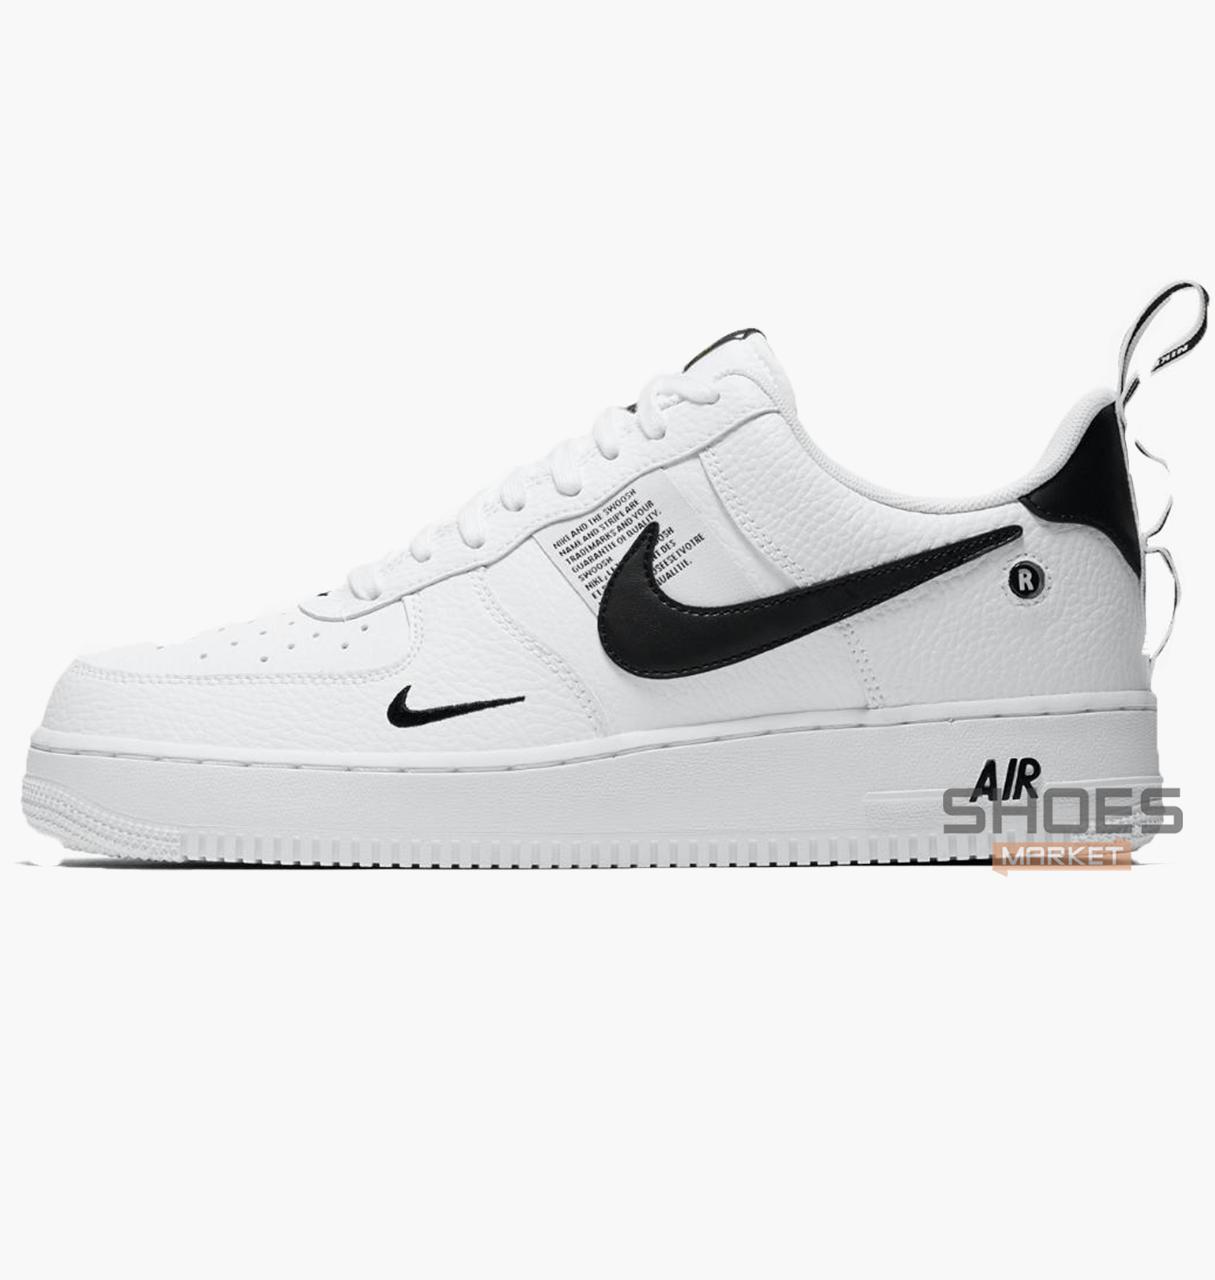 cf1d7b9f Мужские кроссовки Nike Air Force 1 07' LV8 Utility White AJ7747-100,  оригинал